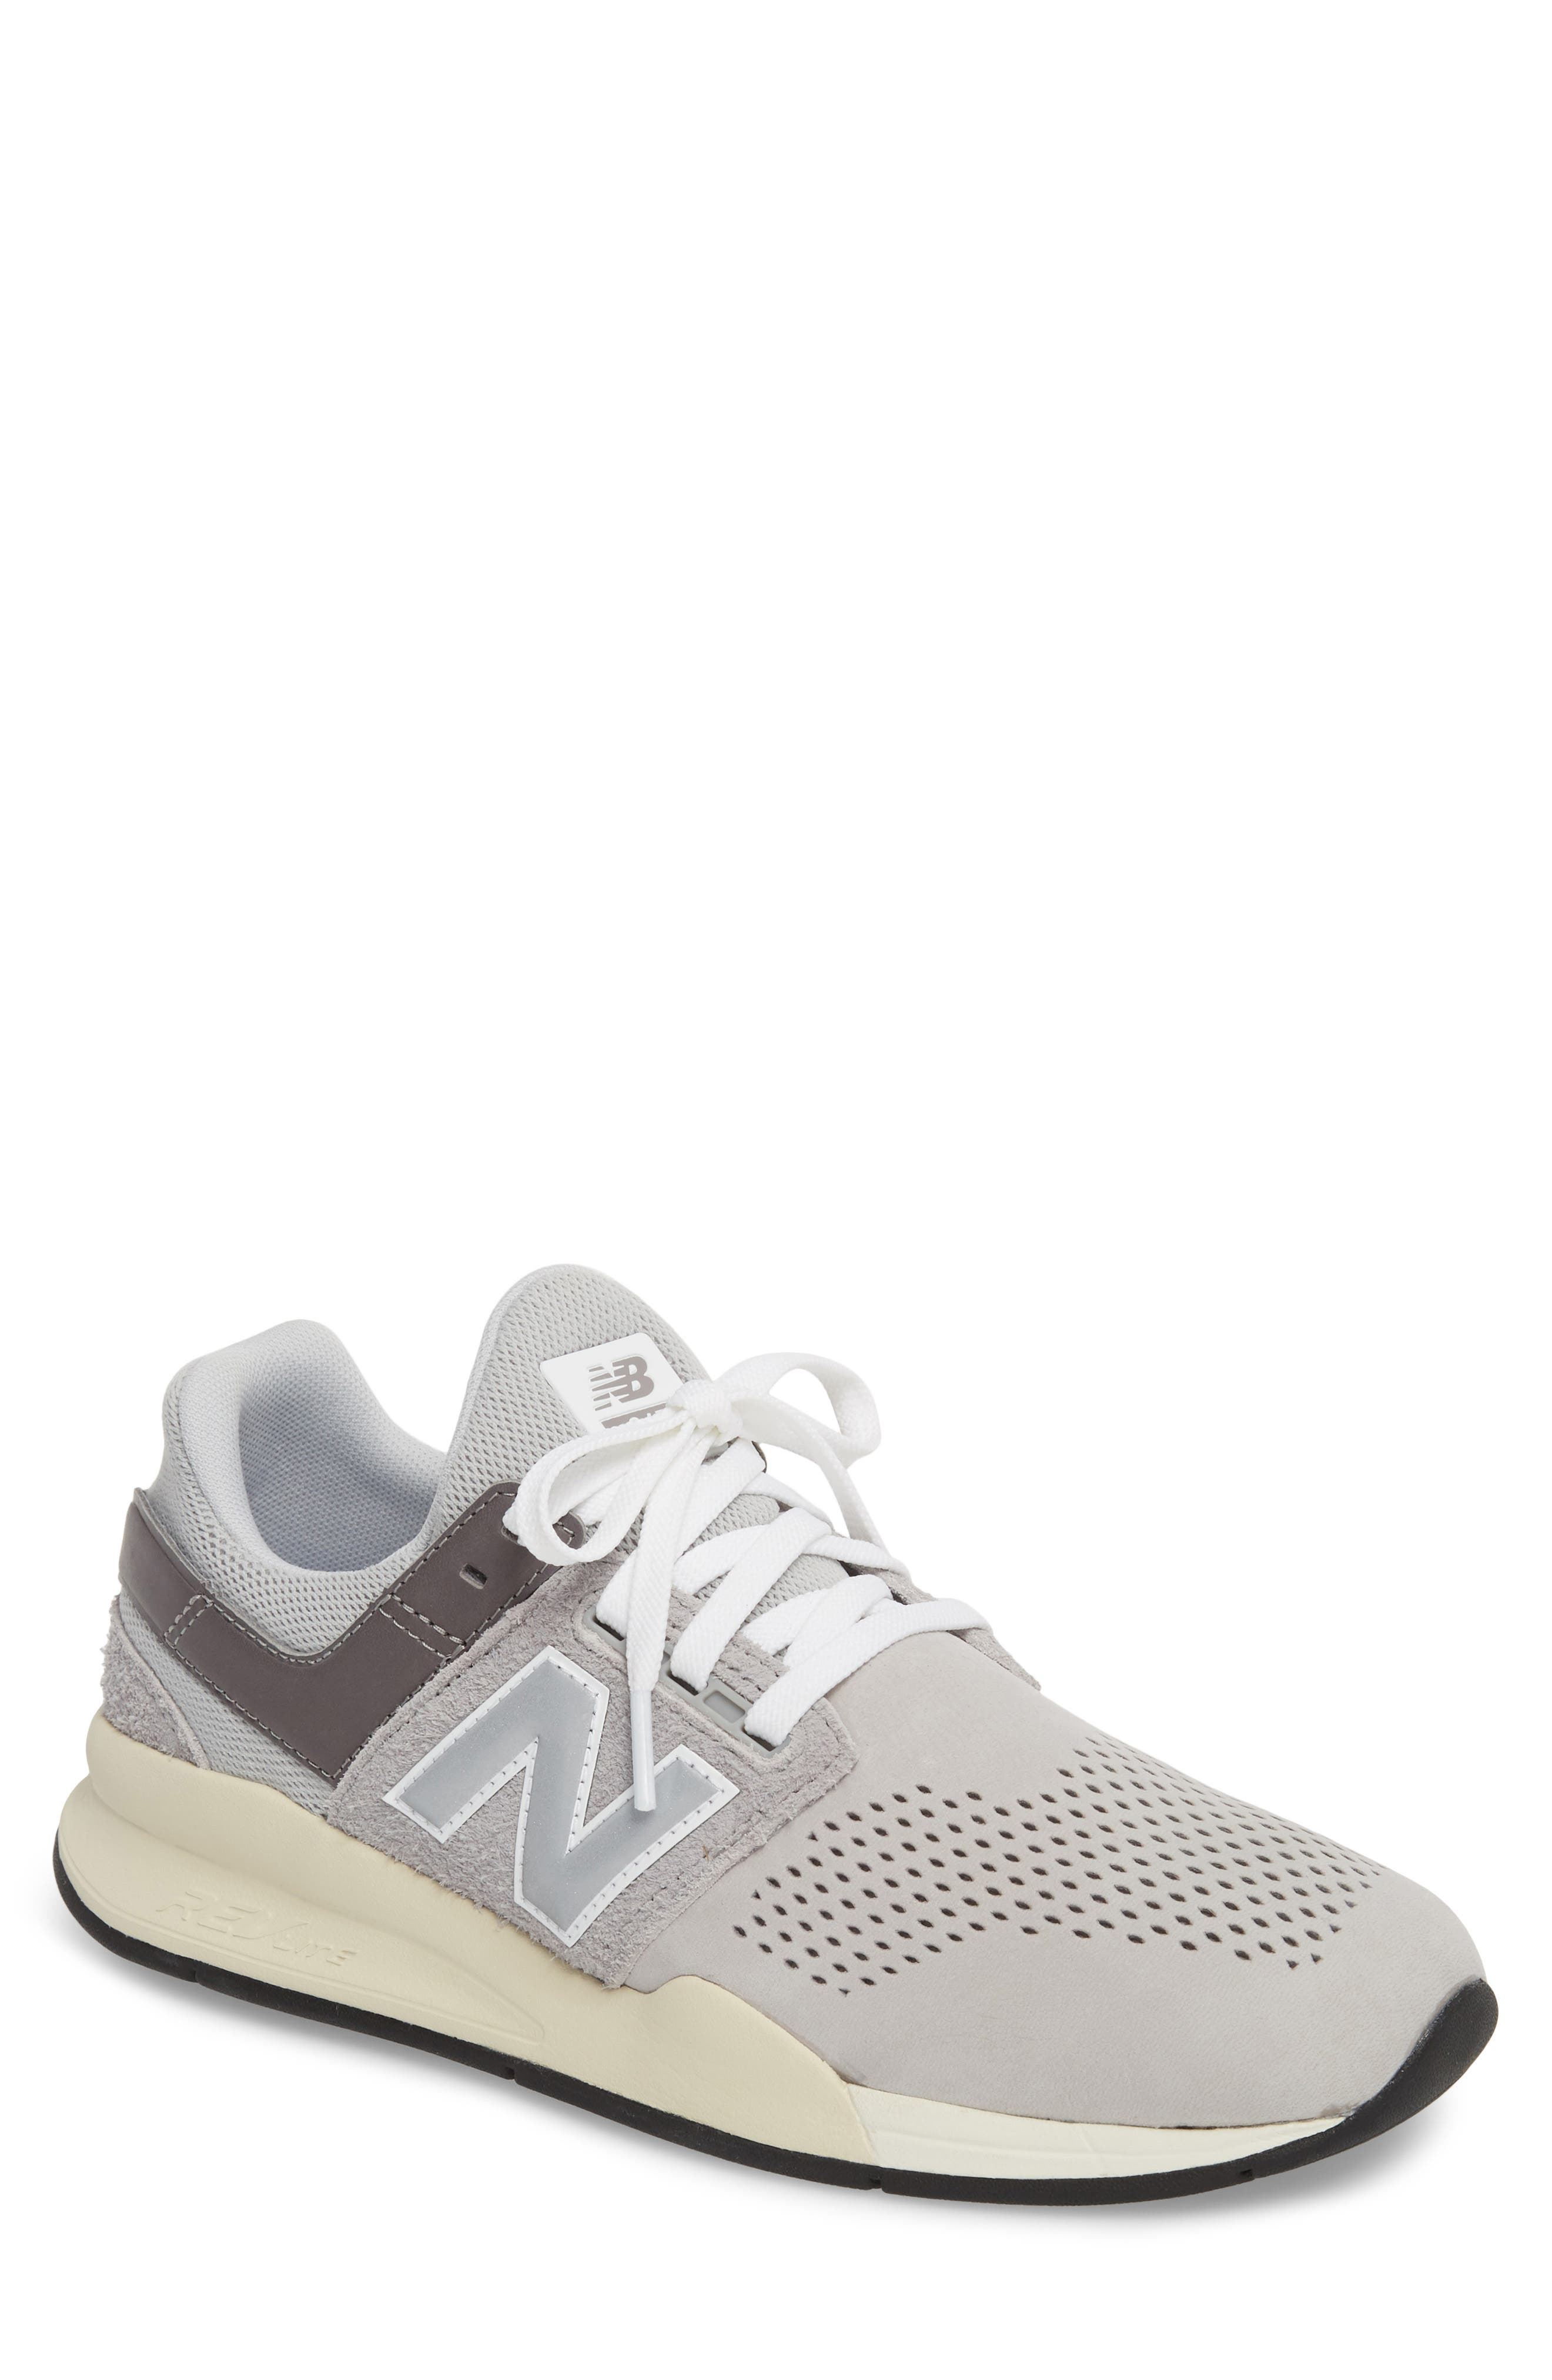 247 v2 Sneaker,                             Main thumbnail 1, color,                             Rain Cloud Leather